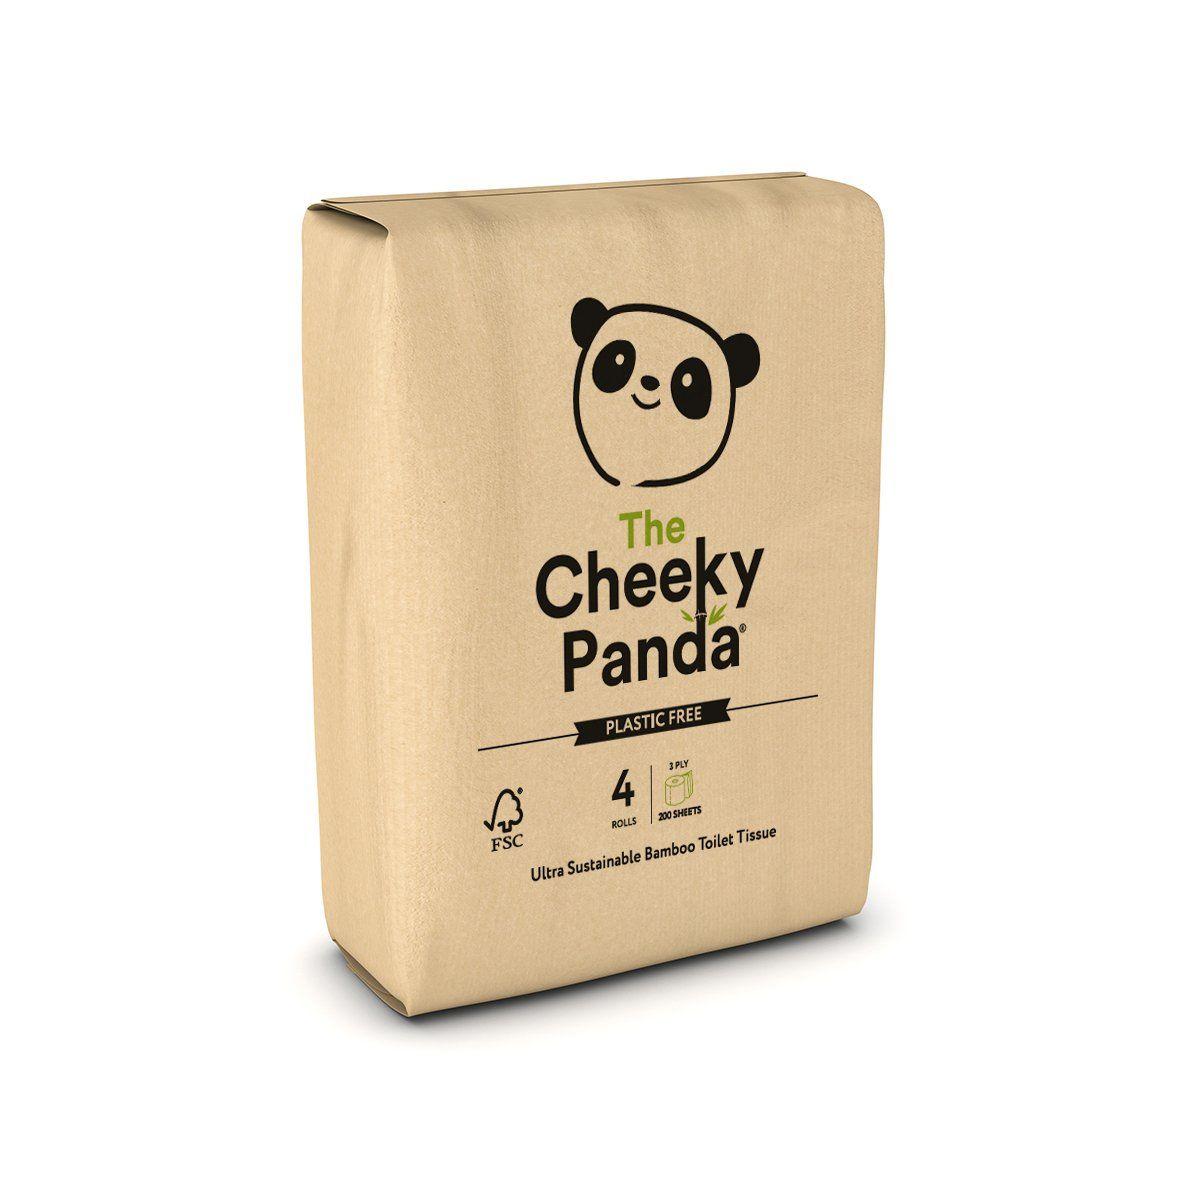 Cheeky Panda Plastic Free Toilet Tissue 4 pack Plastic